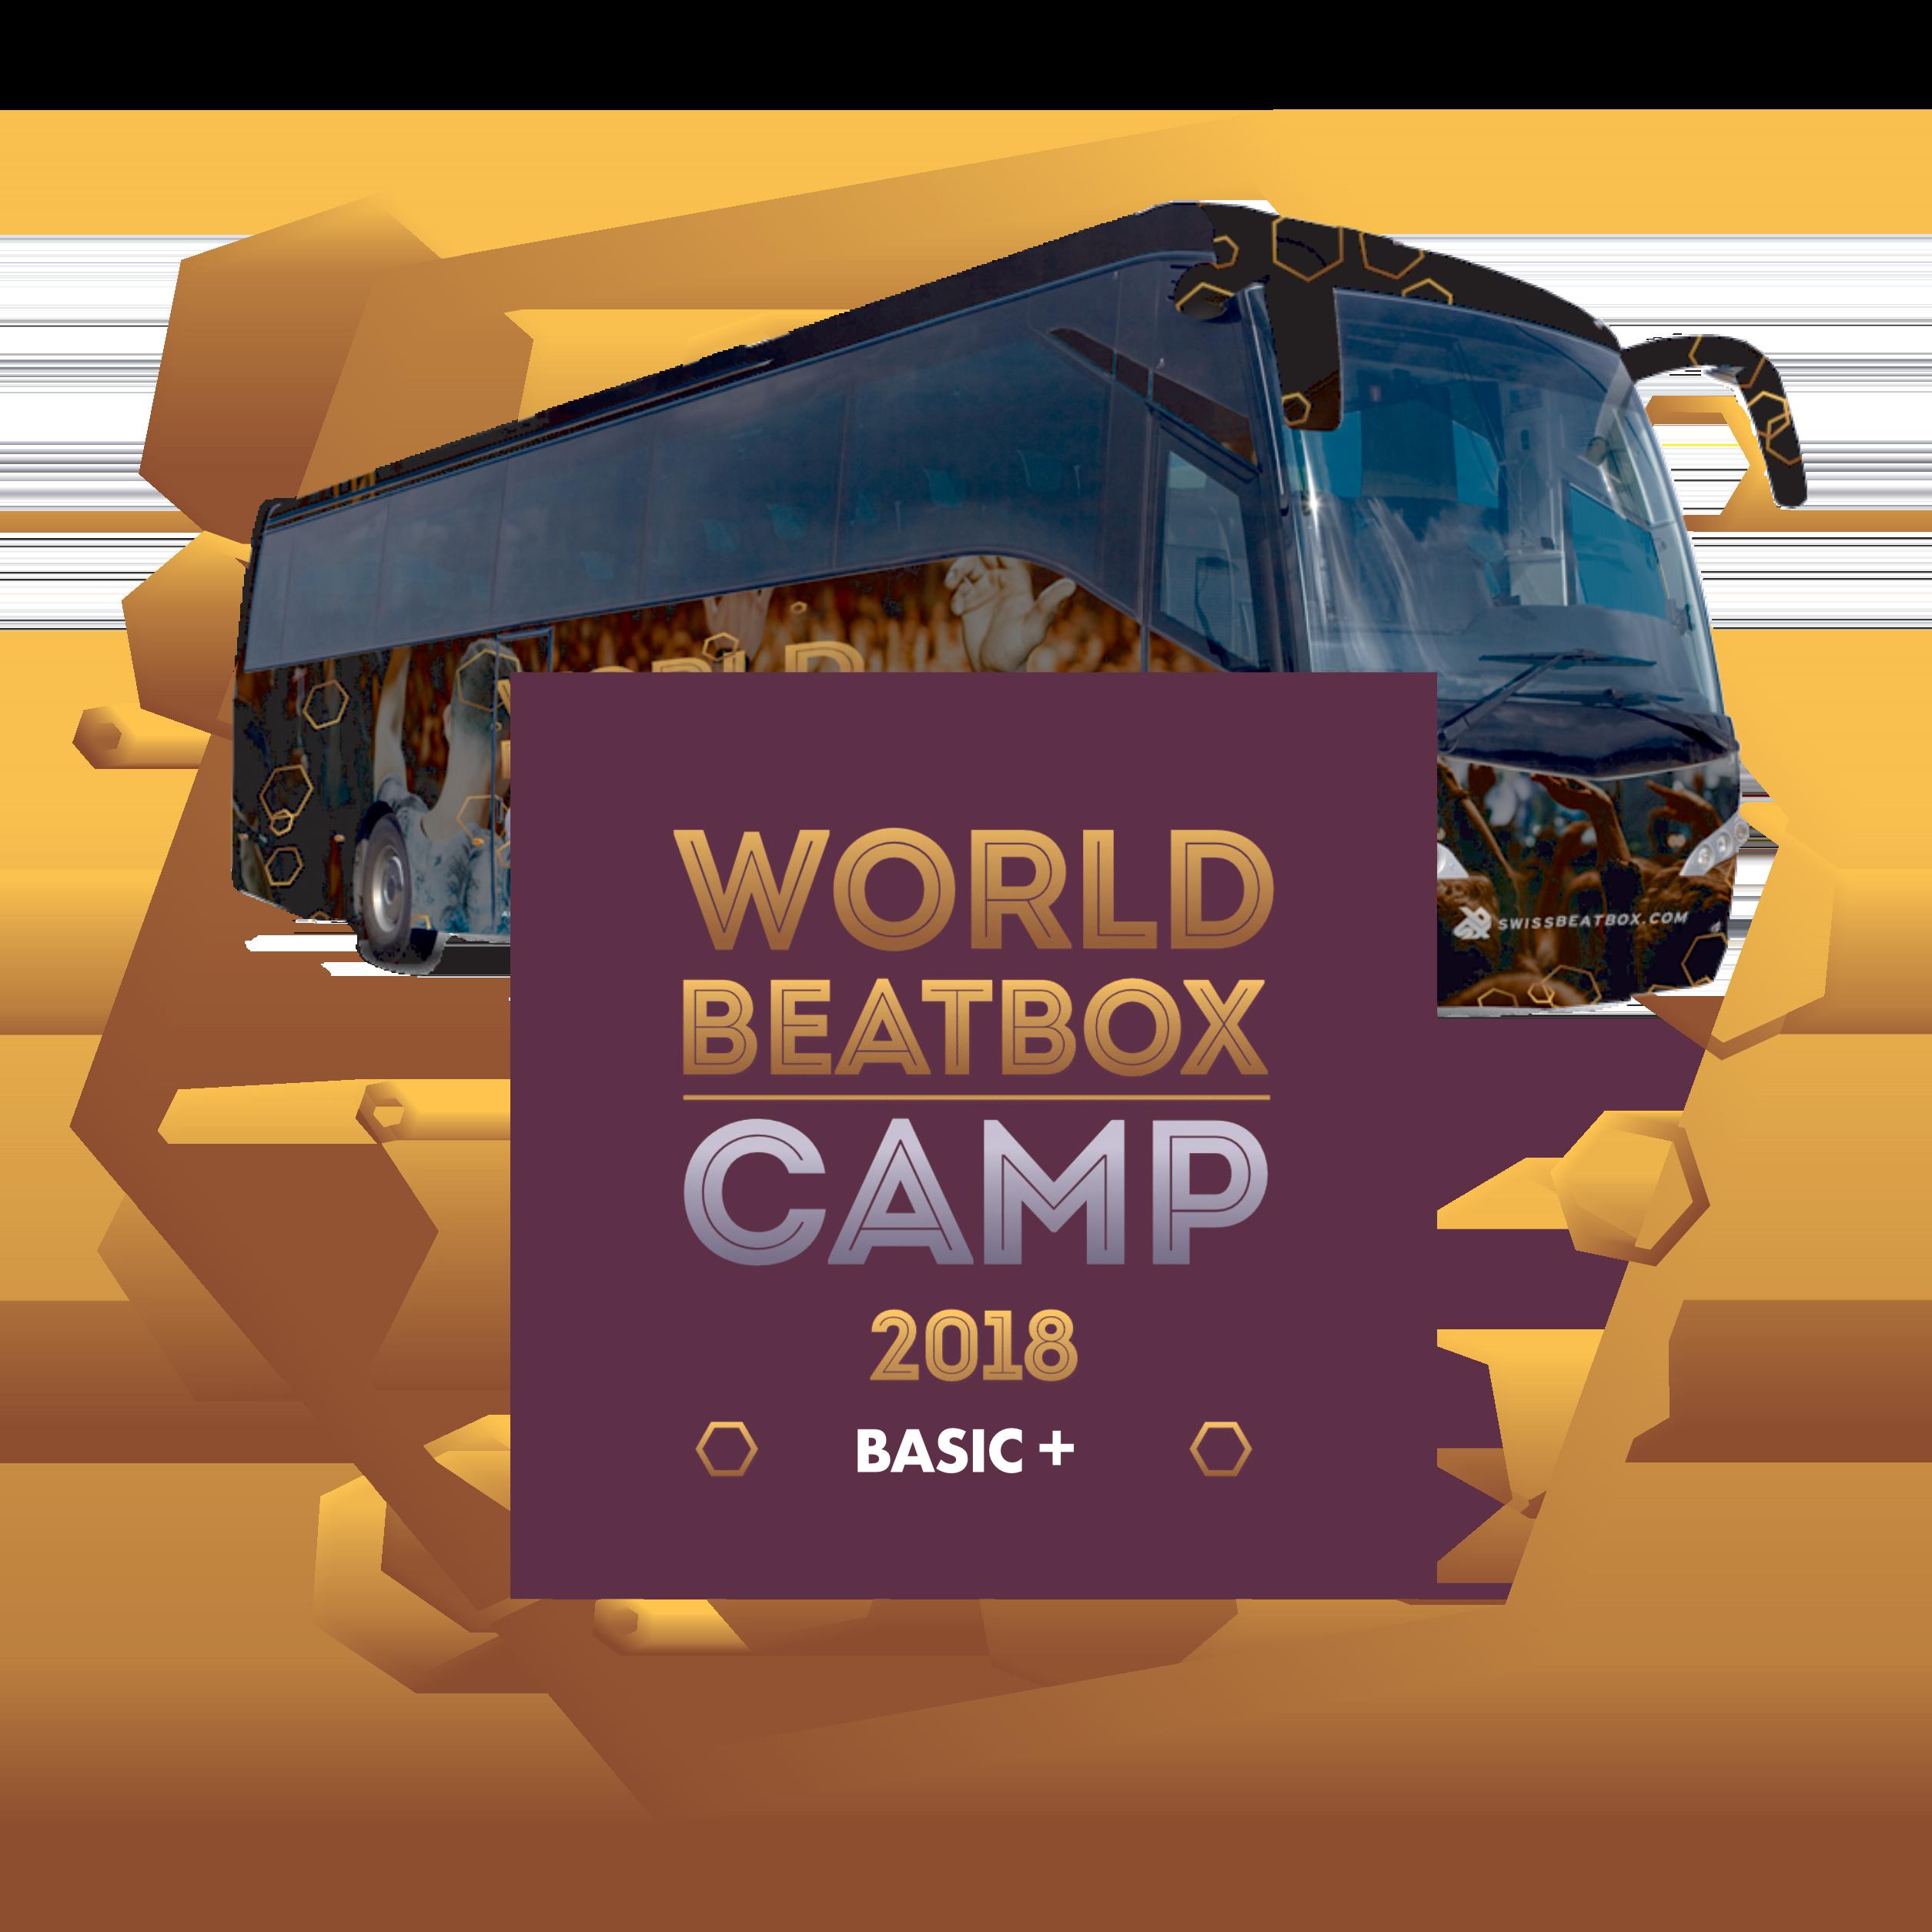 Worldbeatboxcamp Wbc World Beatbox Camp Dharni Reepsone Krakow